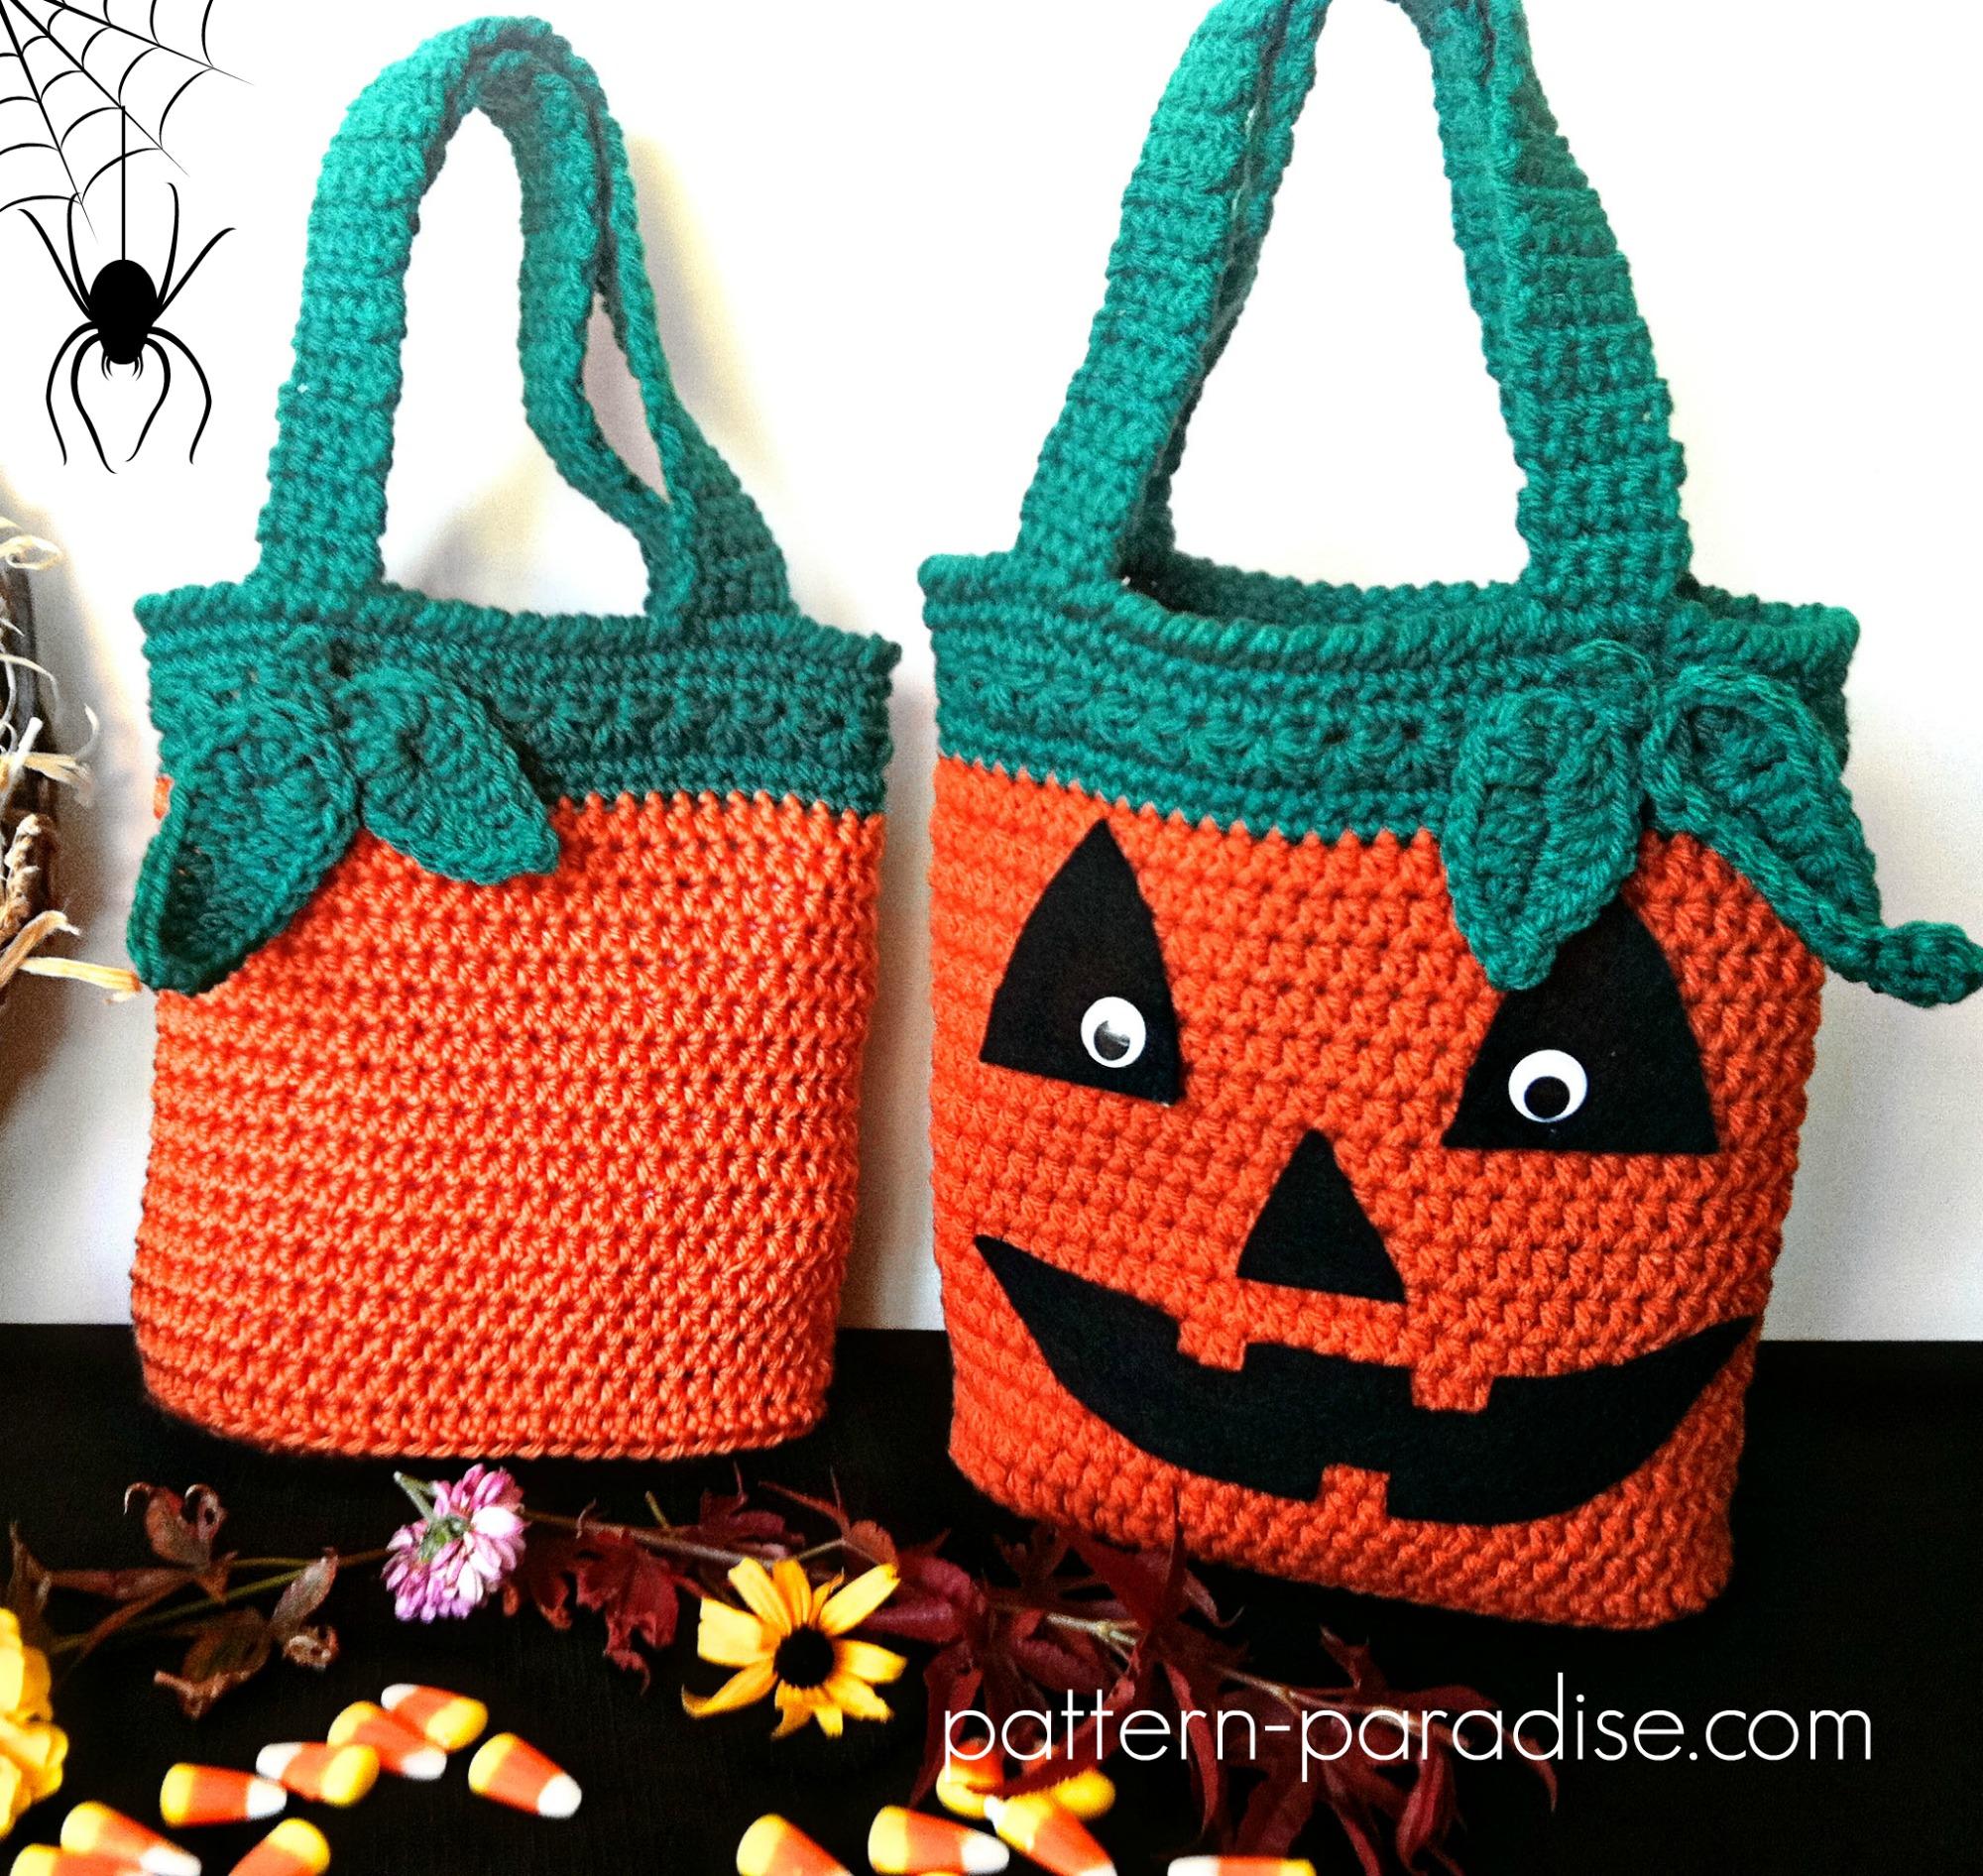 sock bag glow in the dark Knitting,crochet project bag Halloween skeletons 9x10